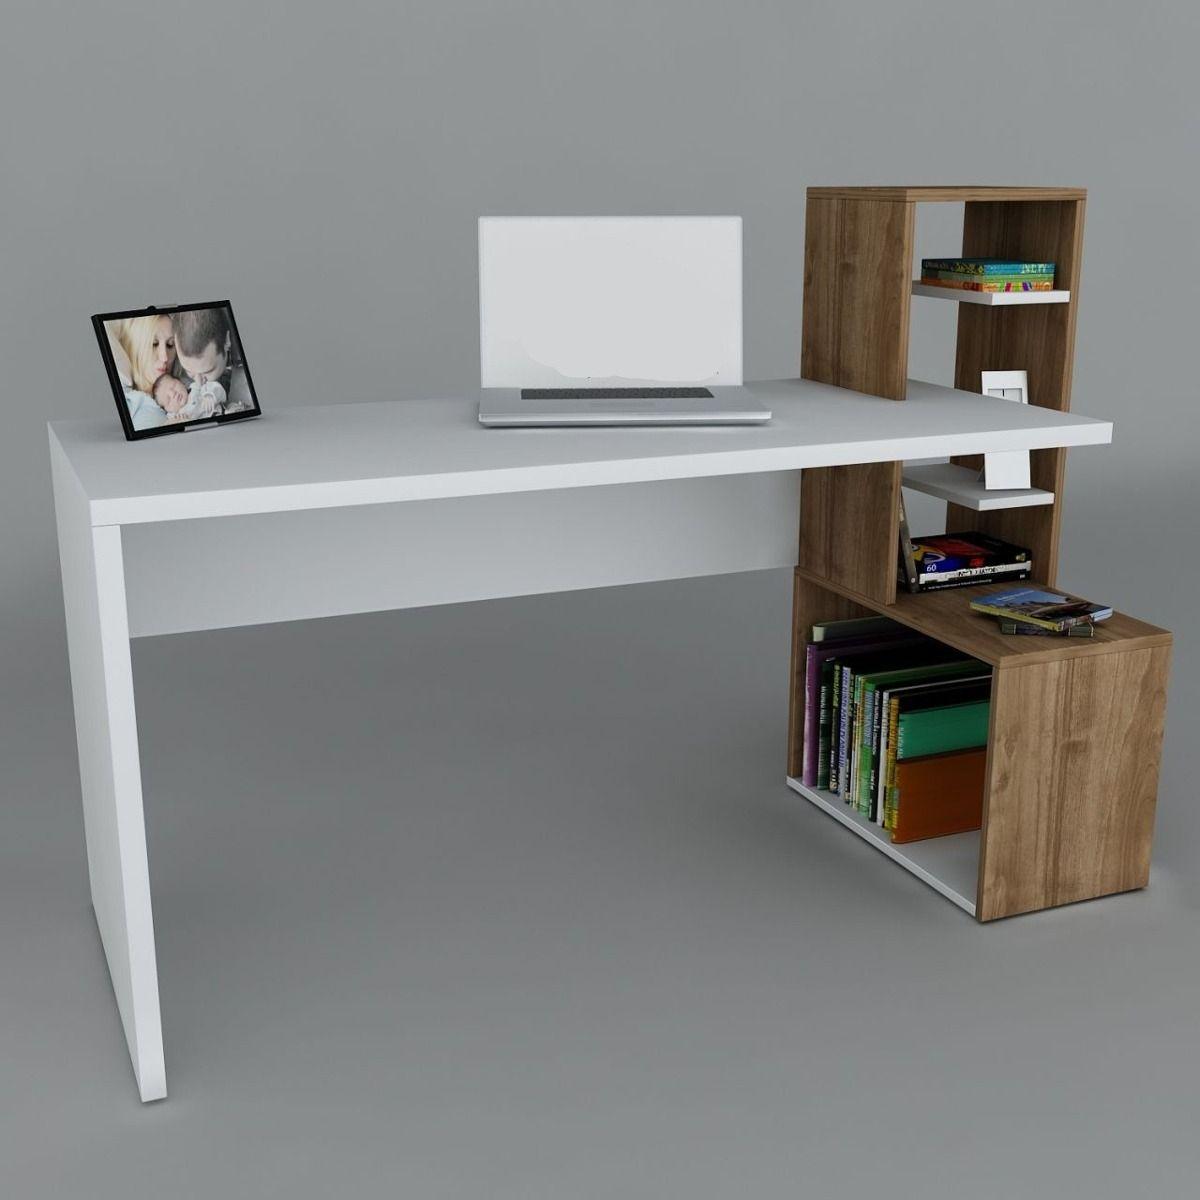 Escritorio de pc con repisas flotantes buscar con google for Muebles de oficina blancos